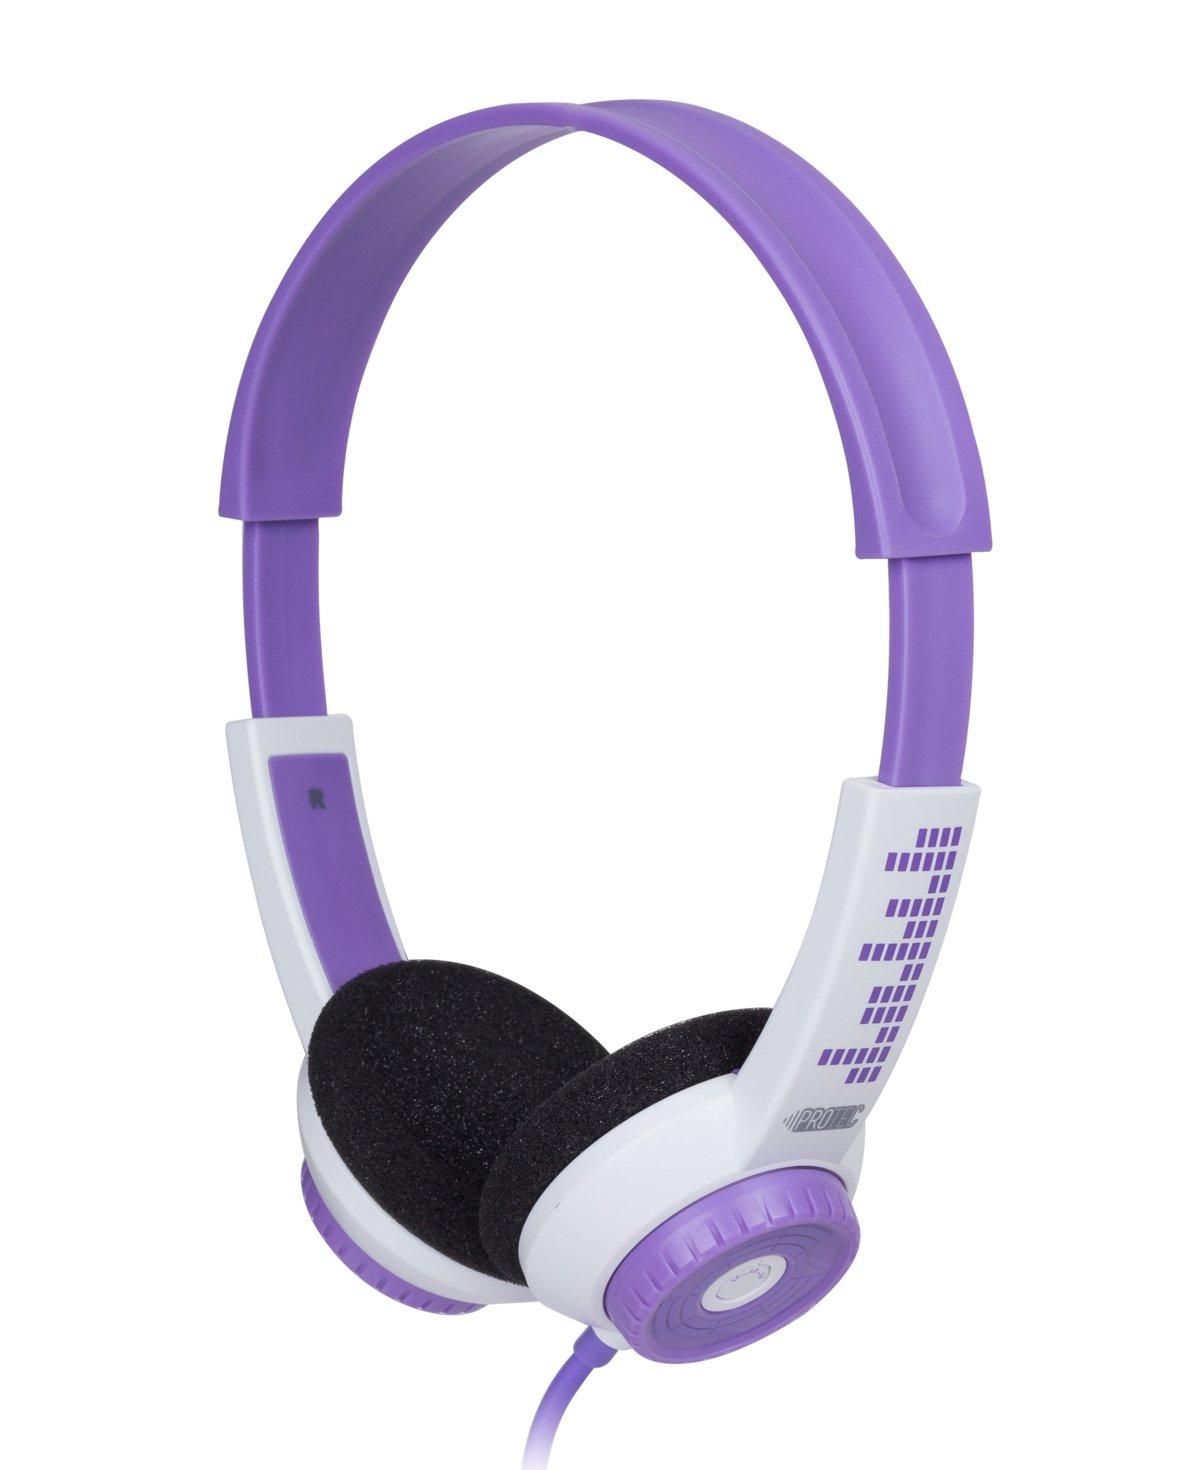 e29edd472fb Amazon.com: FSL Protec Kids Headphones with Adjustable Volume Limiting  (Purple): Home Audio & Theater